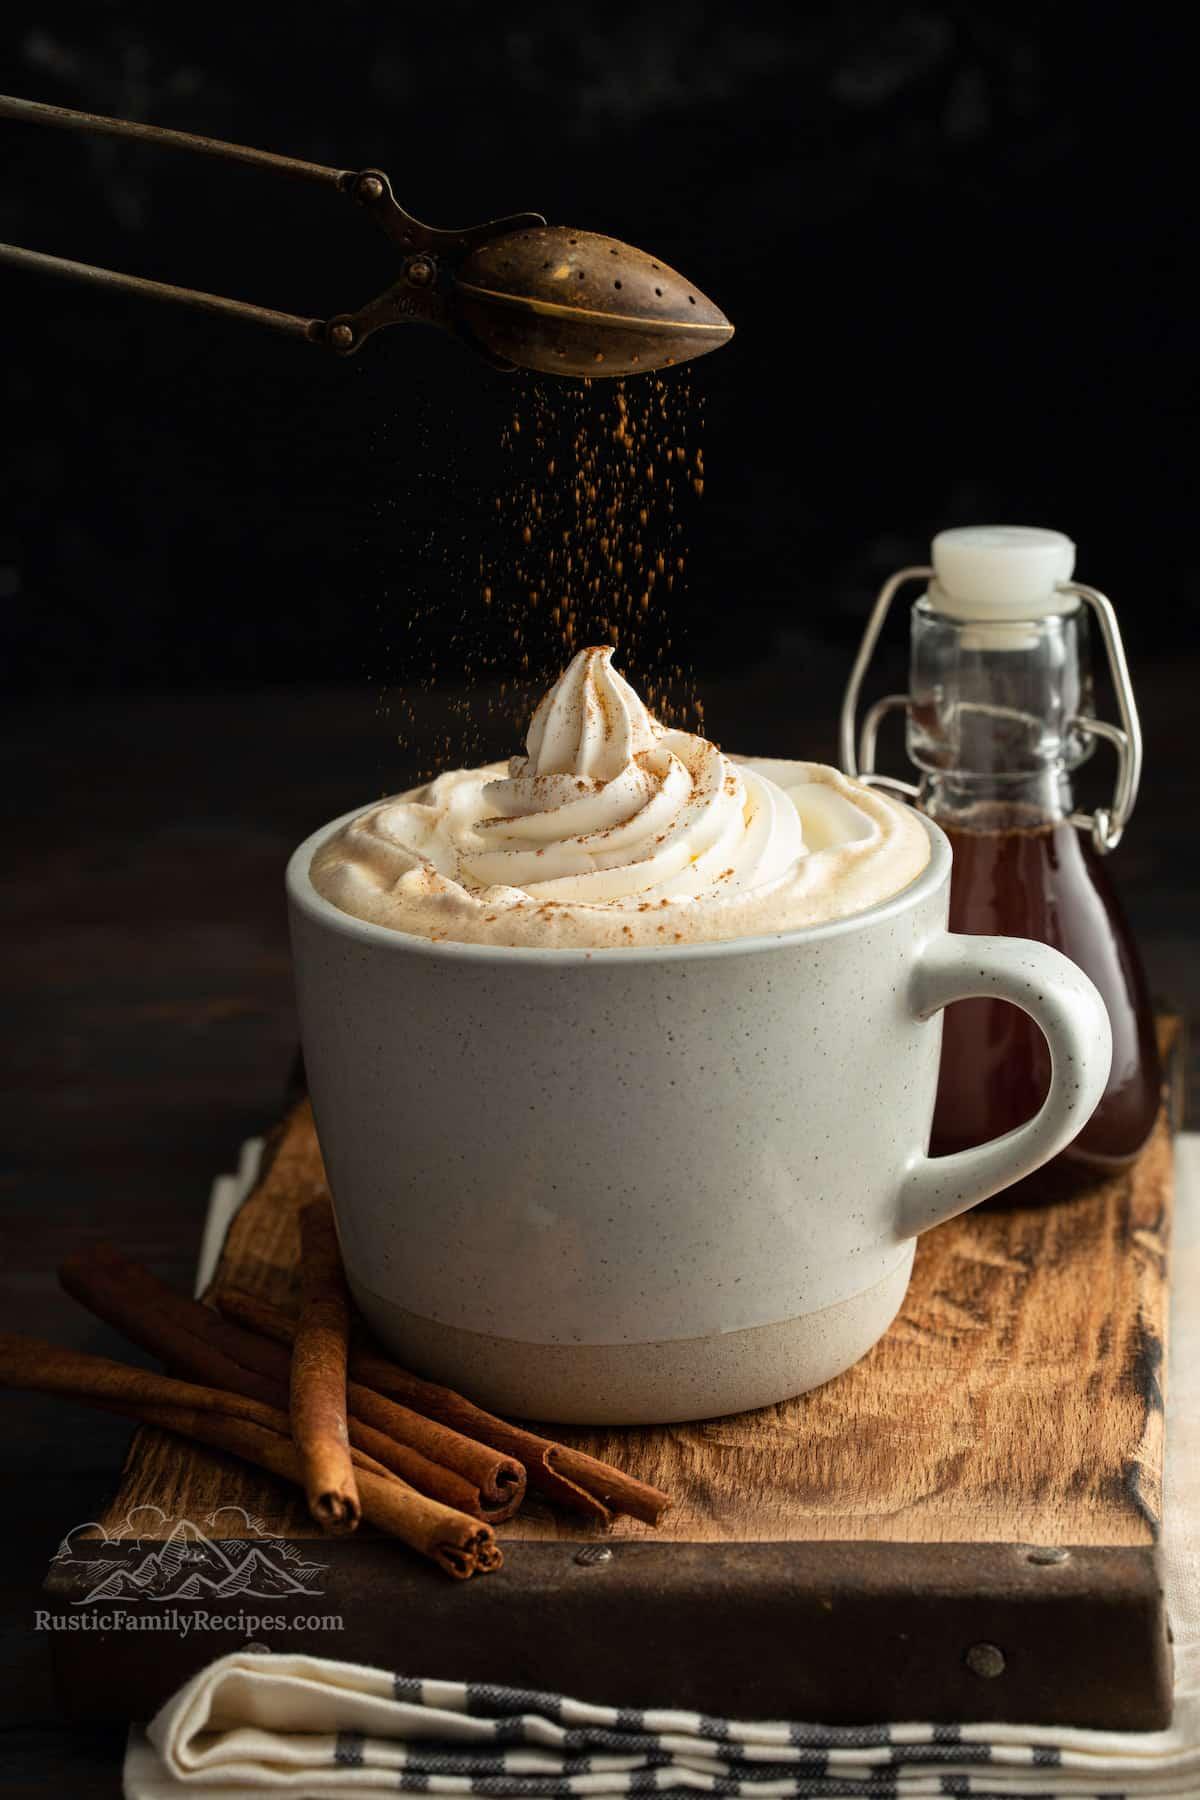 Sprinkling cinnamon on whipped cream in a coffee mug.